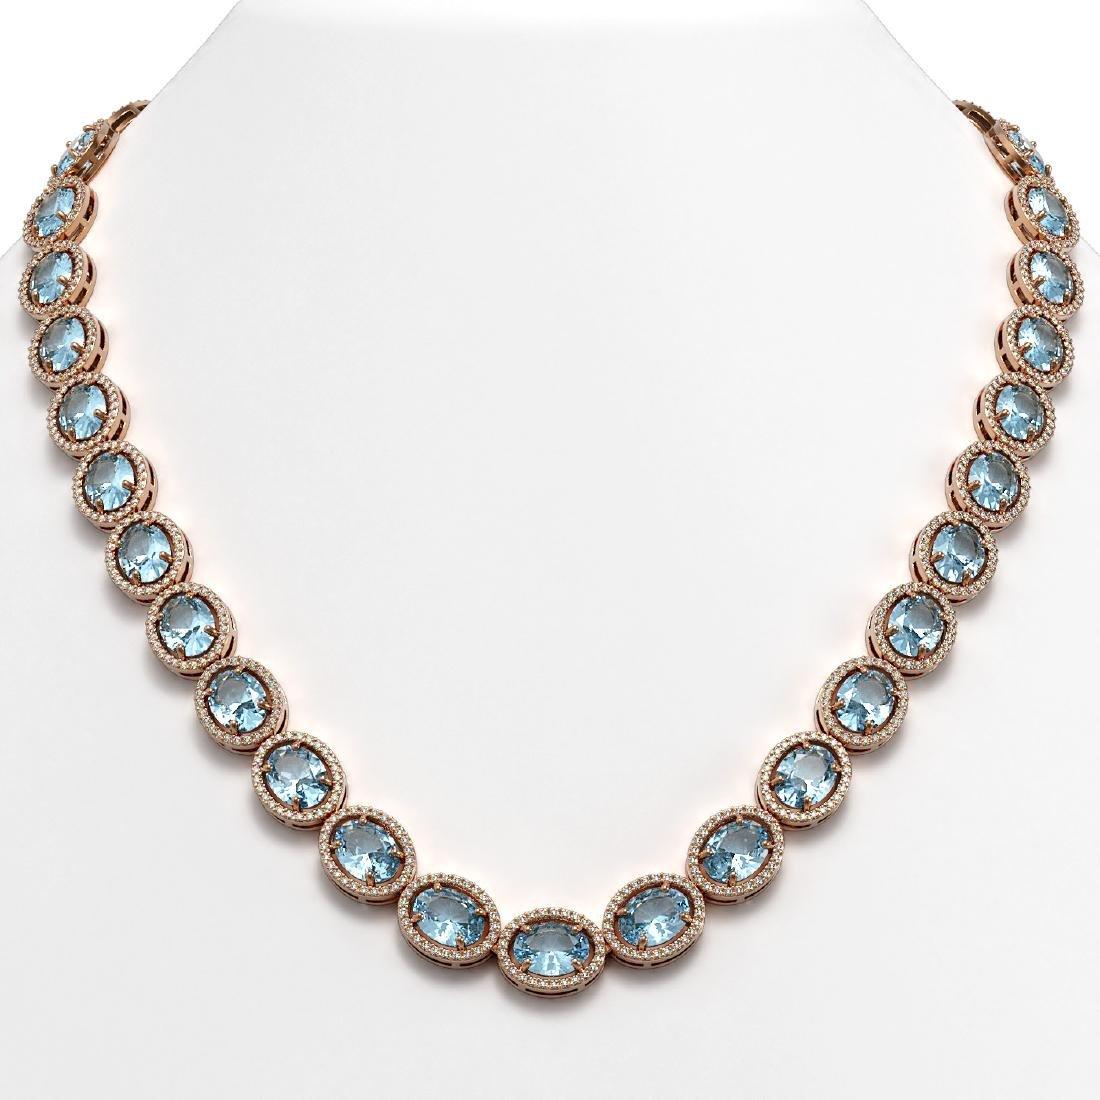 54.11 CTW Aquamarine & Diamond Halo Necklace 10K Rose